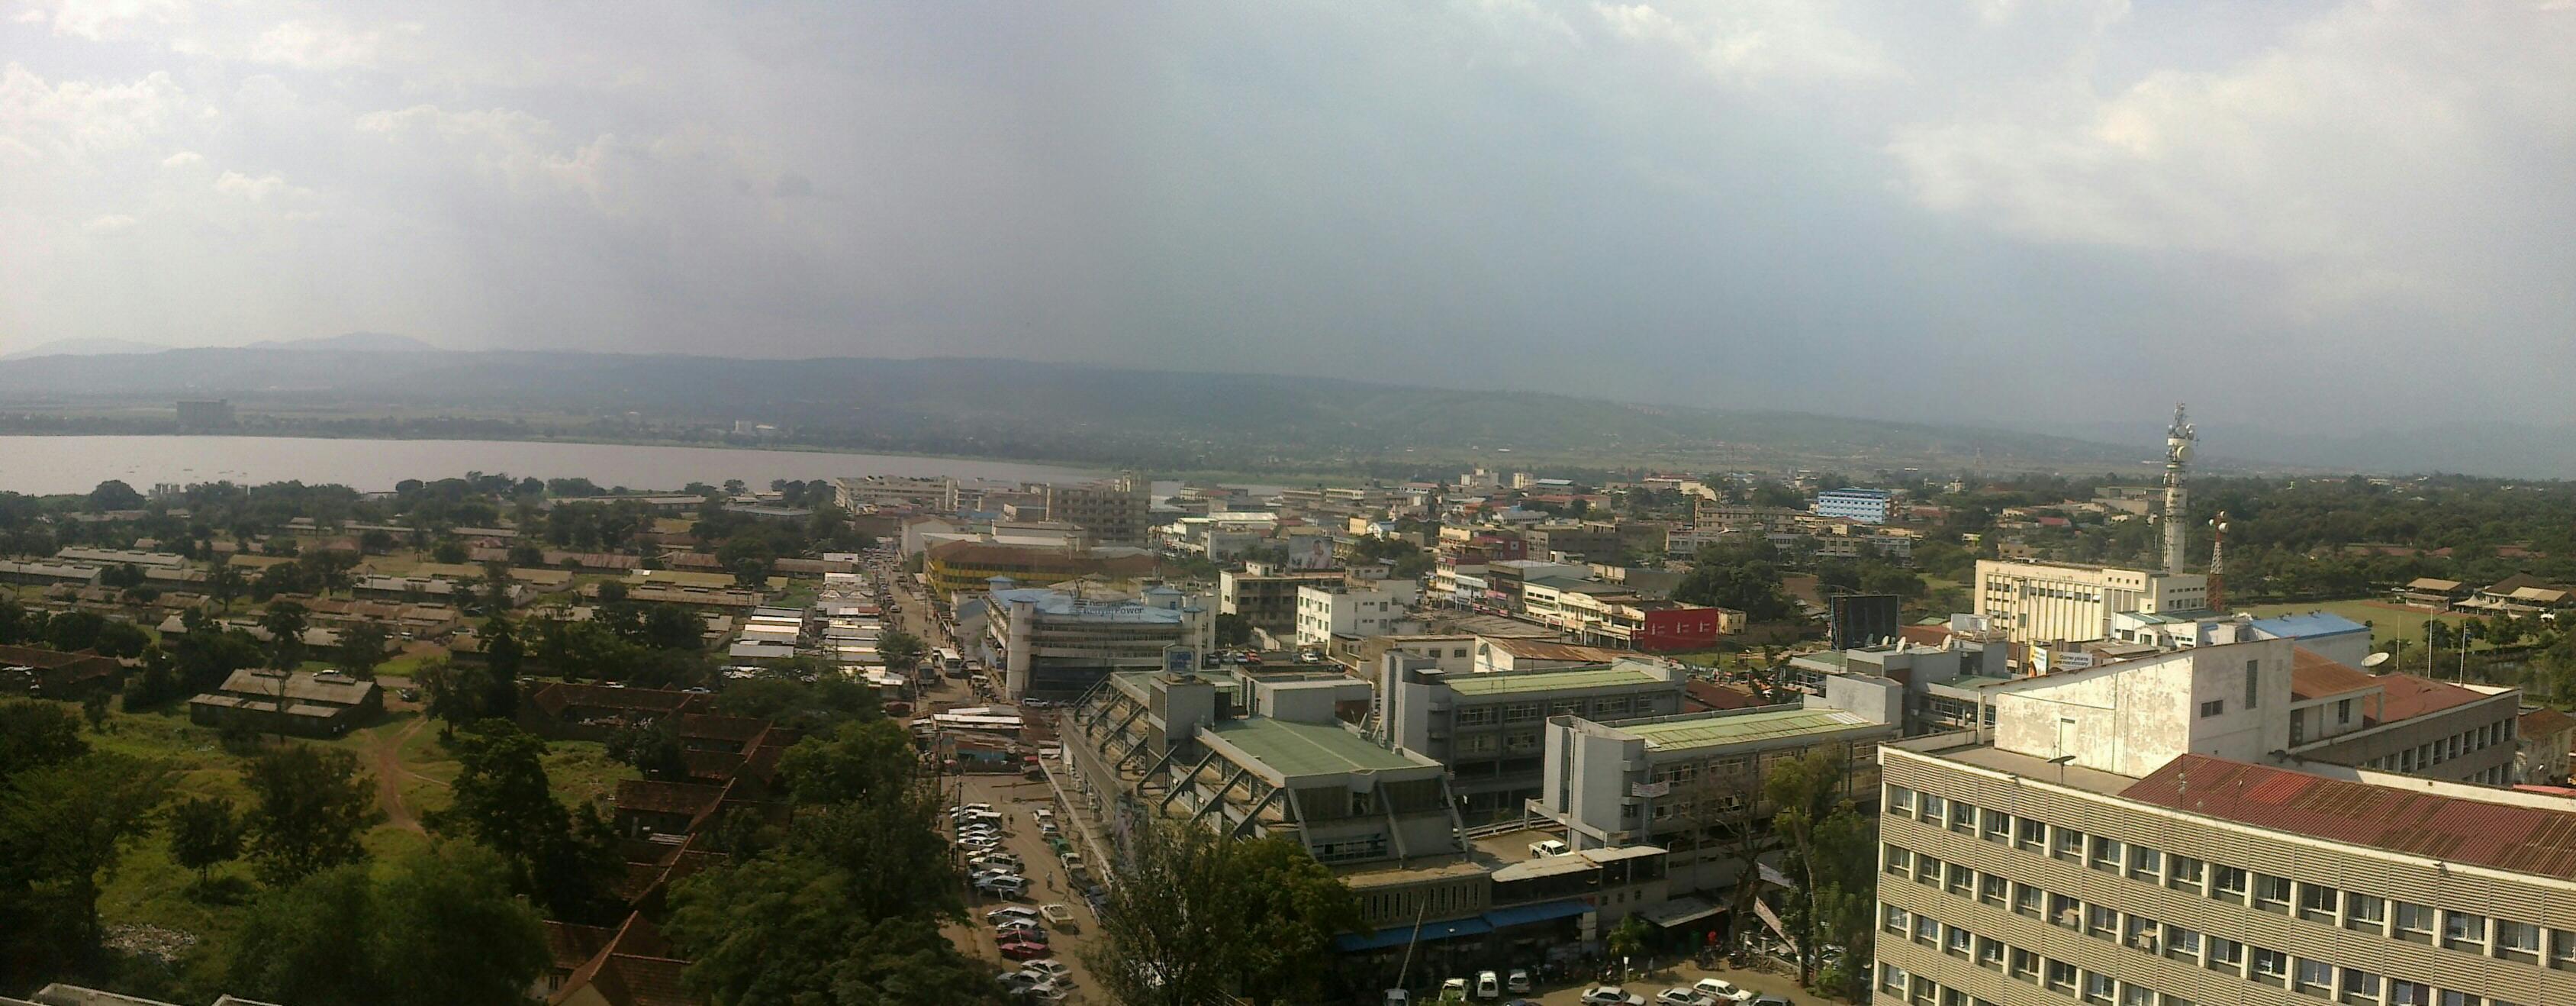 Pictures Photos of kisumu city